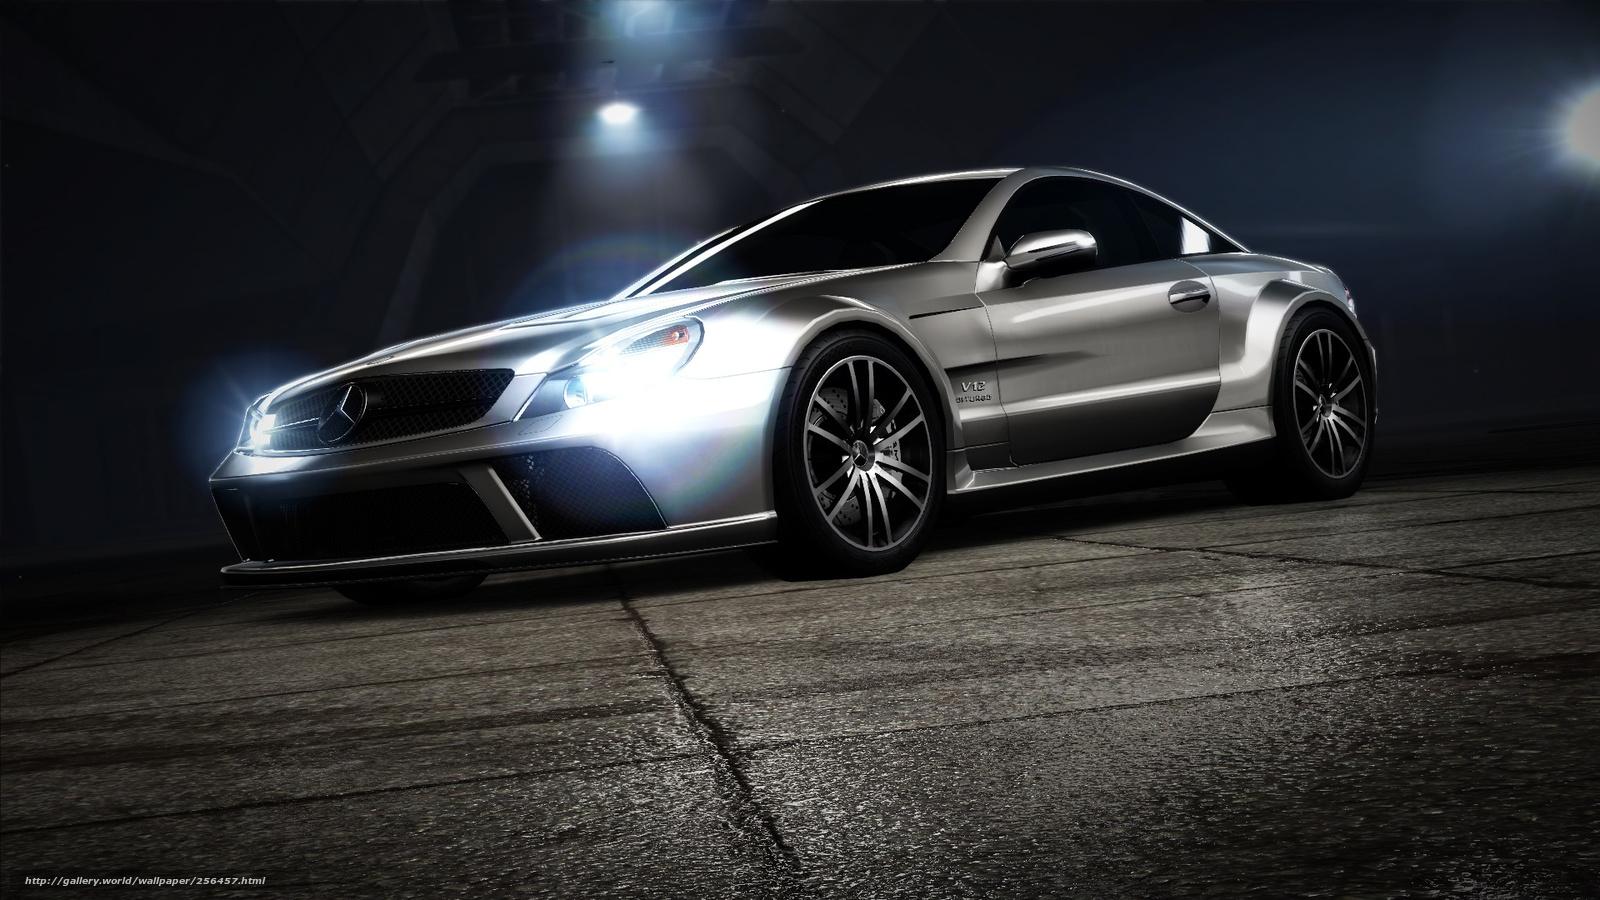 C63 Amg Black Series >> [43+] Mercedes AMG Wallpaper HD on WallpaperSafari